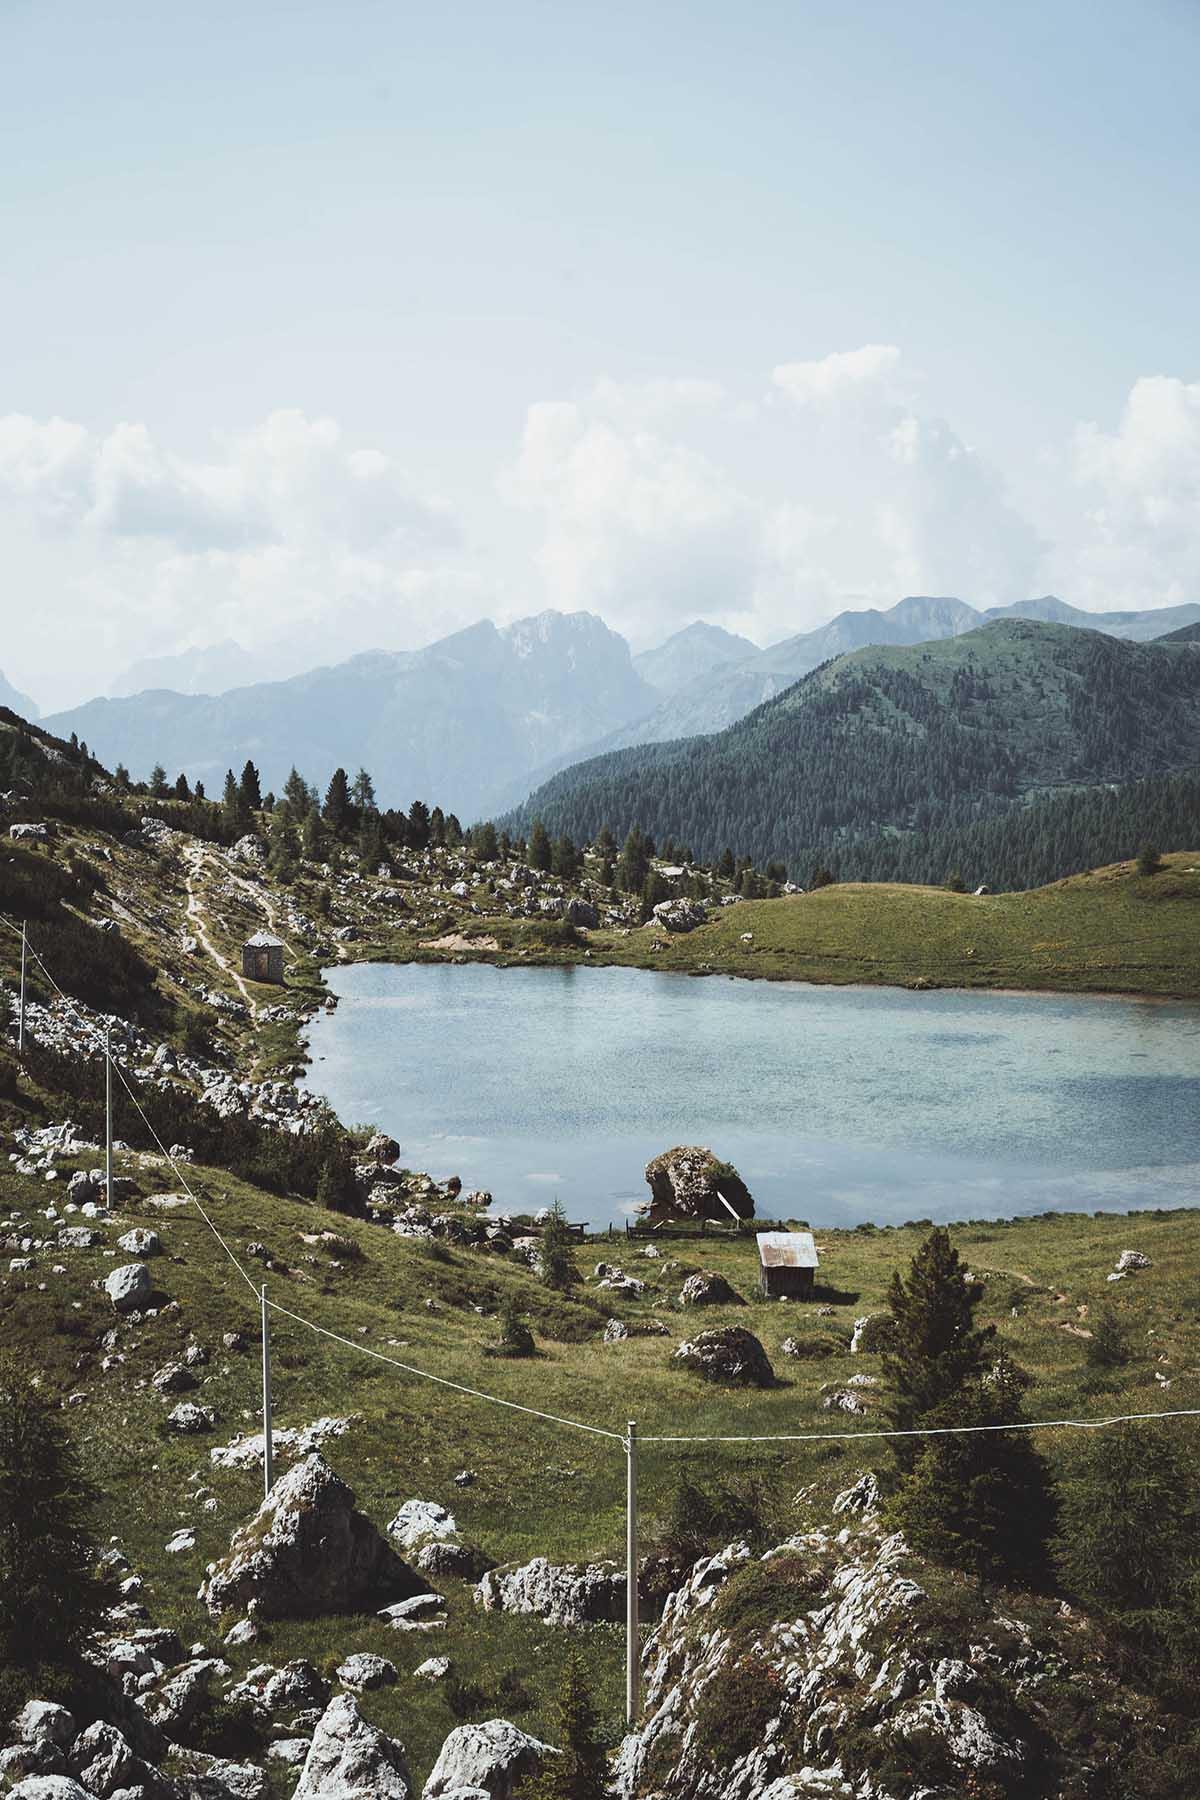 mountain-resort-kolfuschgerhof-dolomiten-see-01